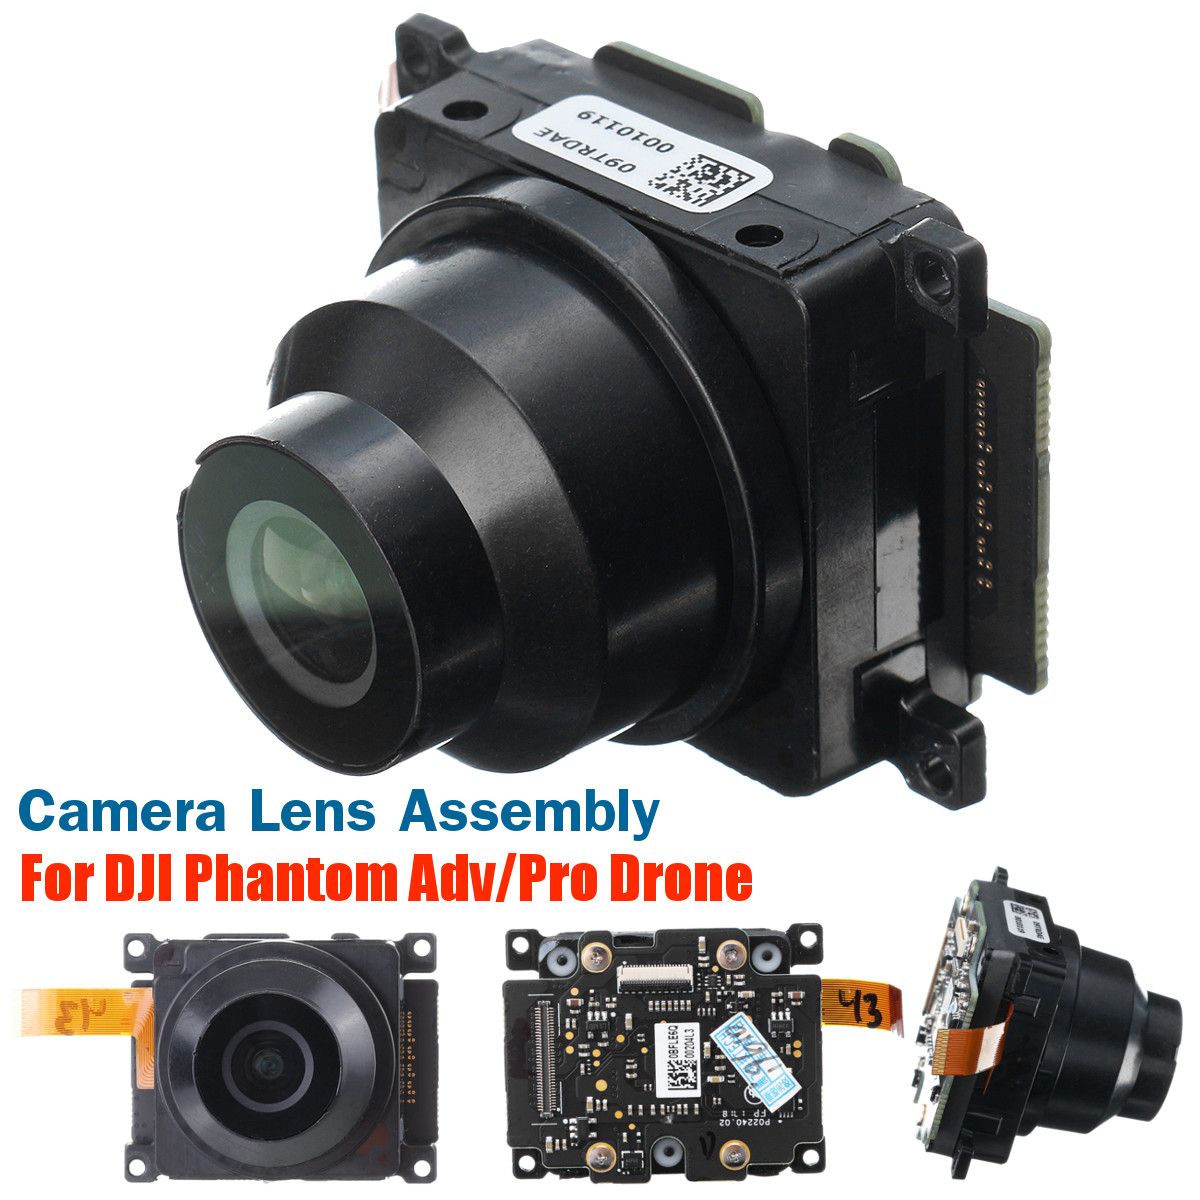 original-for-font-b-dji-b-font-4-font-b-phantom-b-font-camera-lens-head-assembly-motor-gimbal-replacement-repair-spare-parts-camera-lens-for-font-b-dji-b-font-4-pro